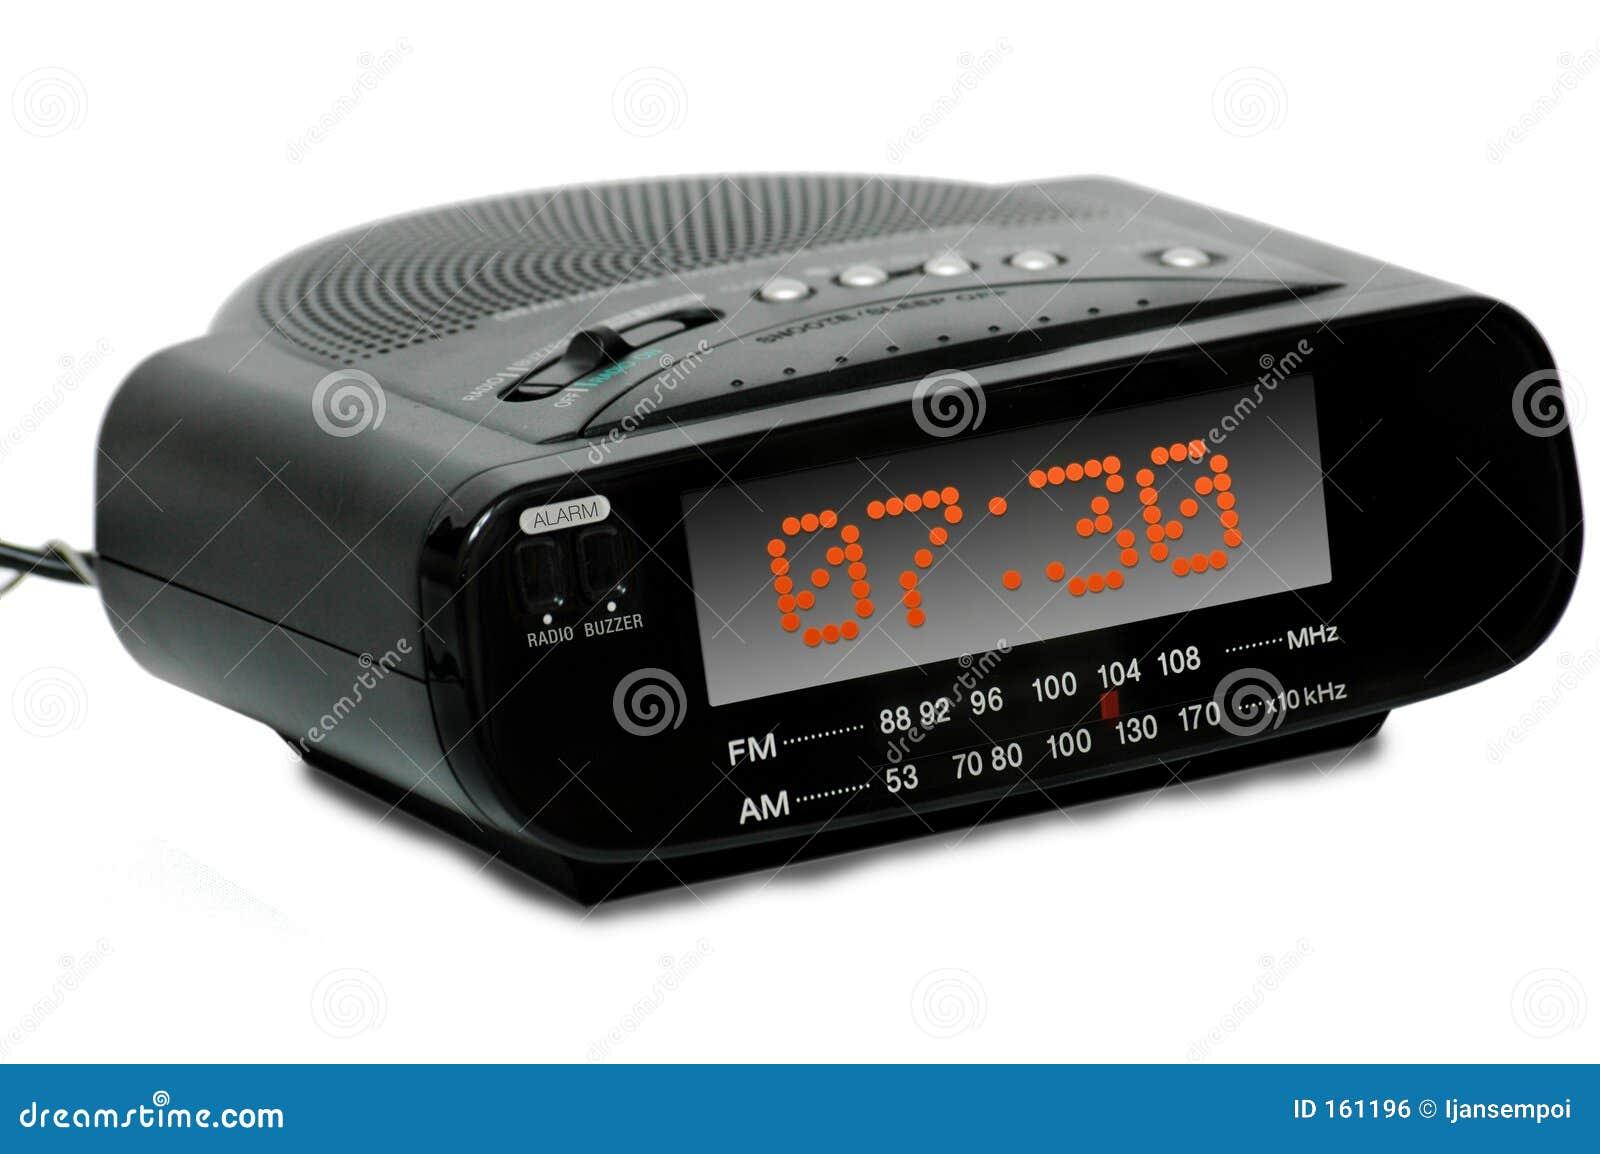 digital alarm radio clock royalty free stock image image 161196. Black Bedroom Furniture Sets. Home Design Ideas